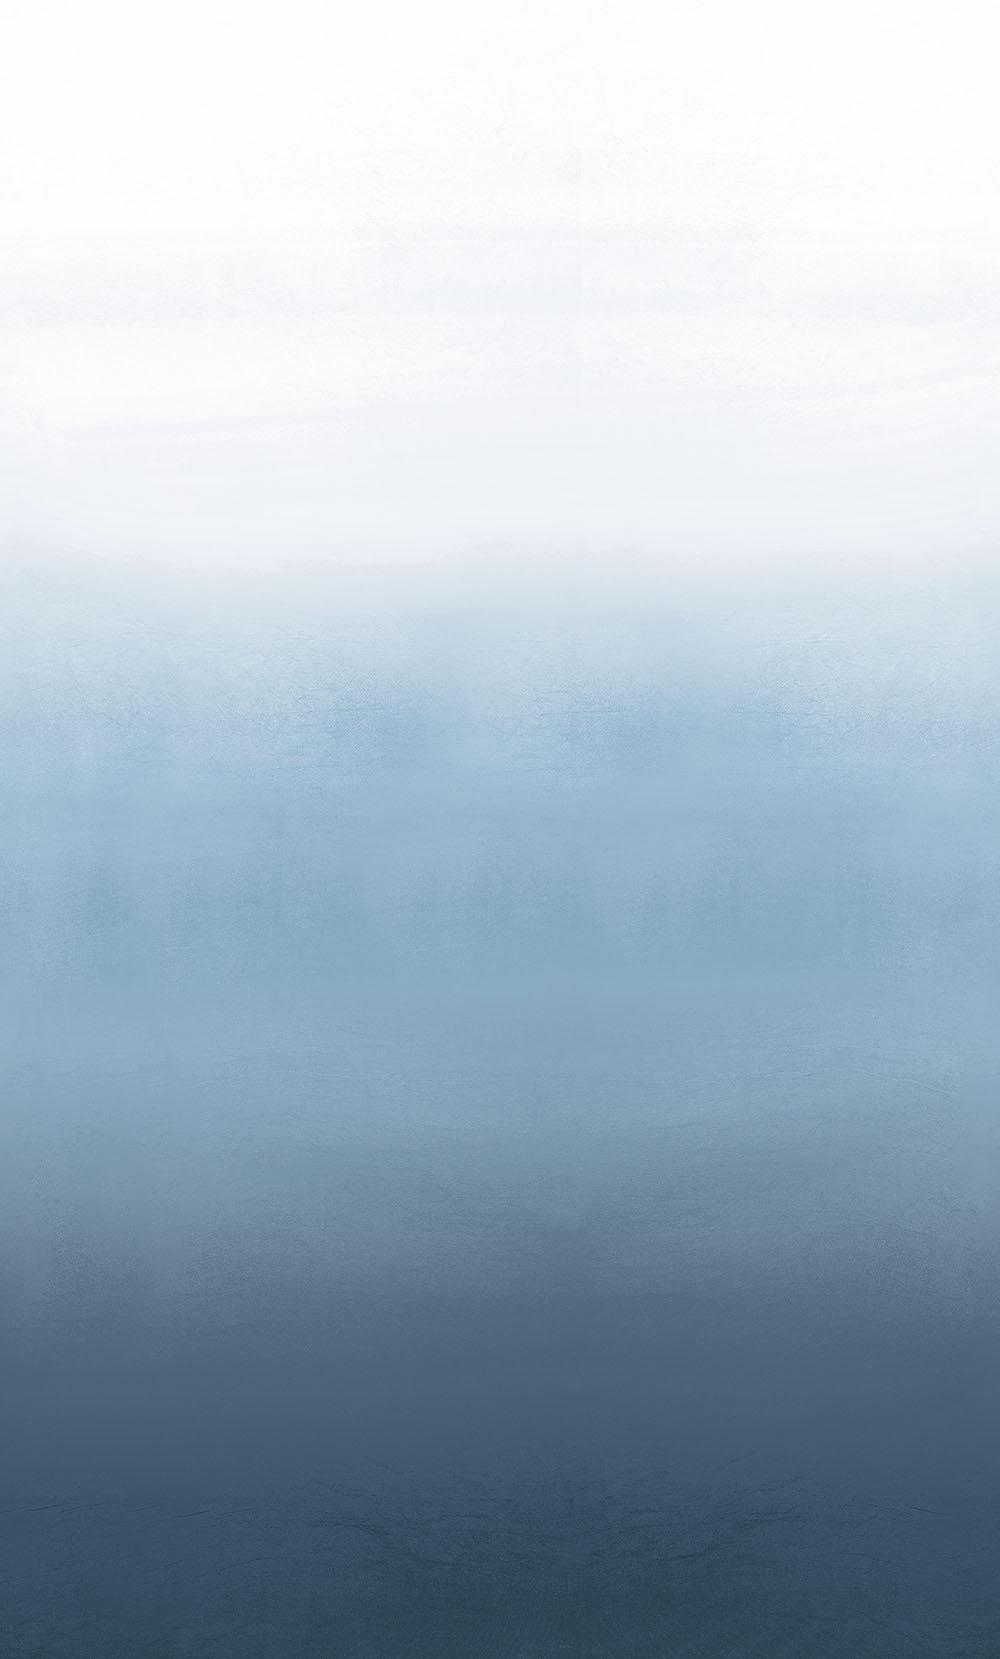 Savoie Mural - Delft - by Designers Guild